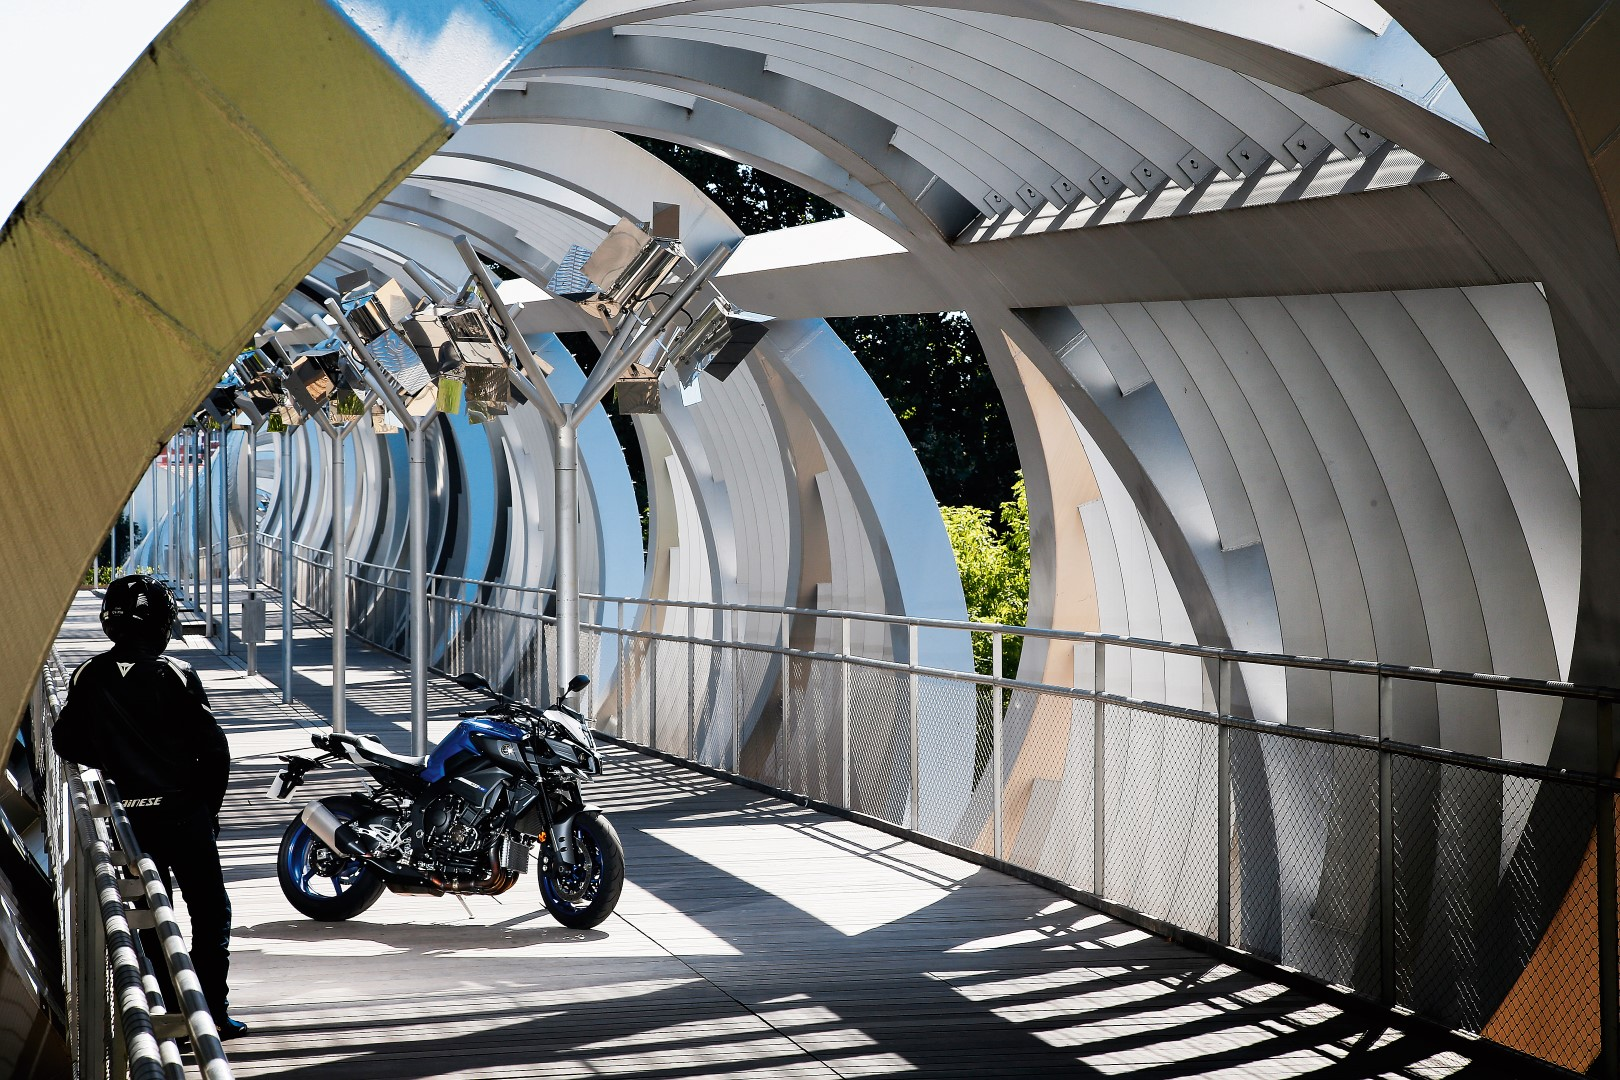 Yamaha MT-10, prueba en imágenes